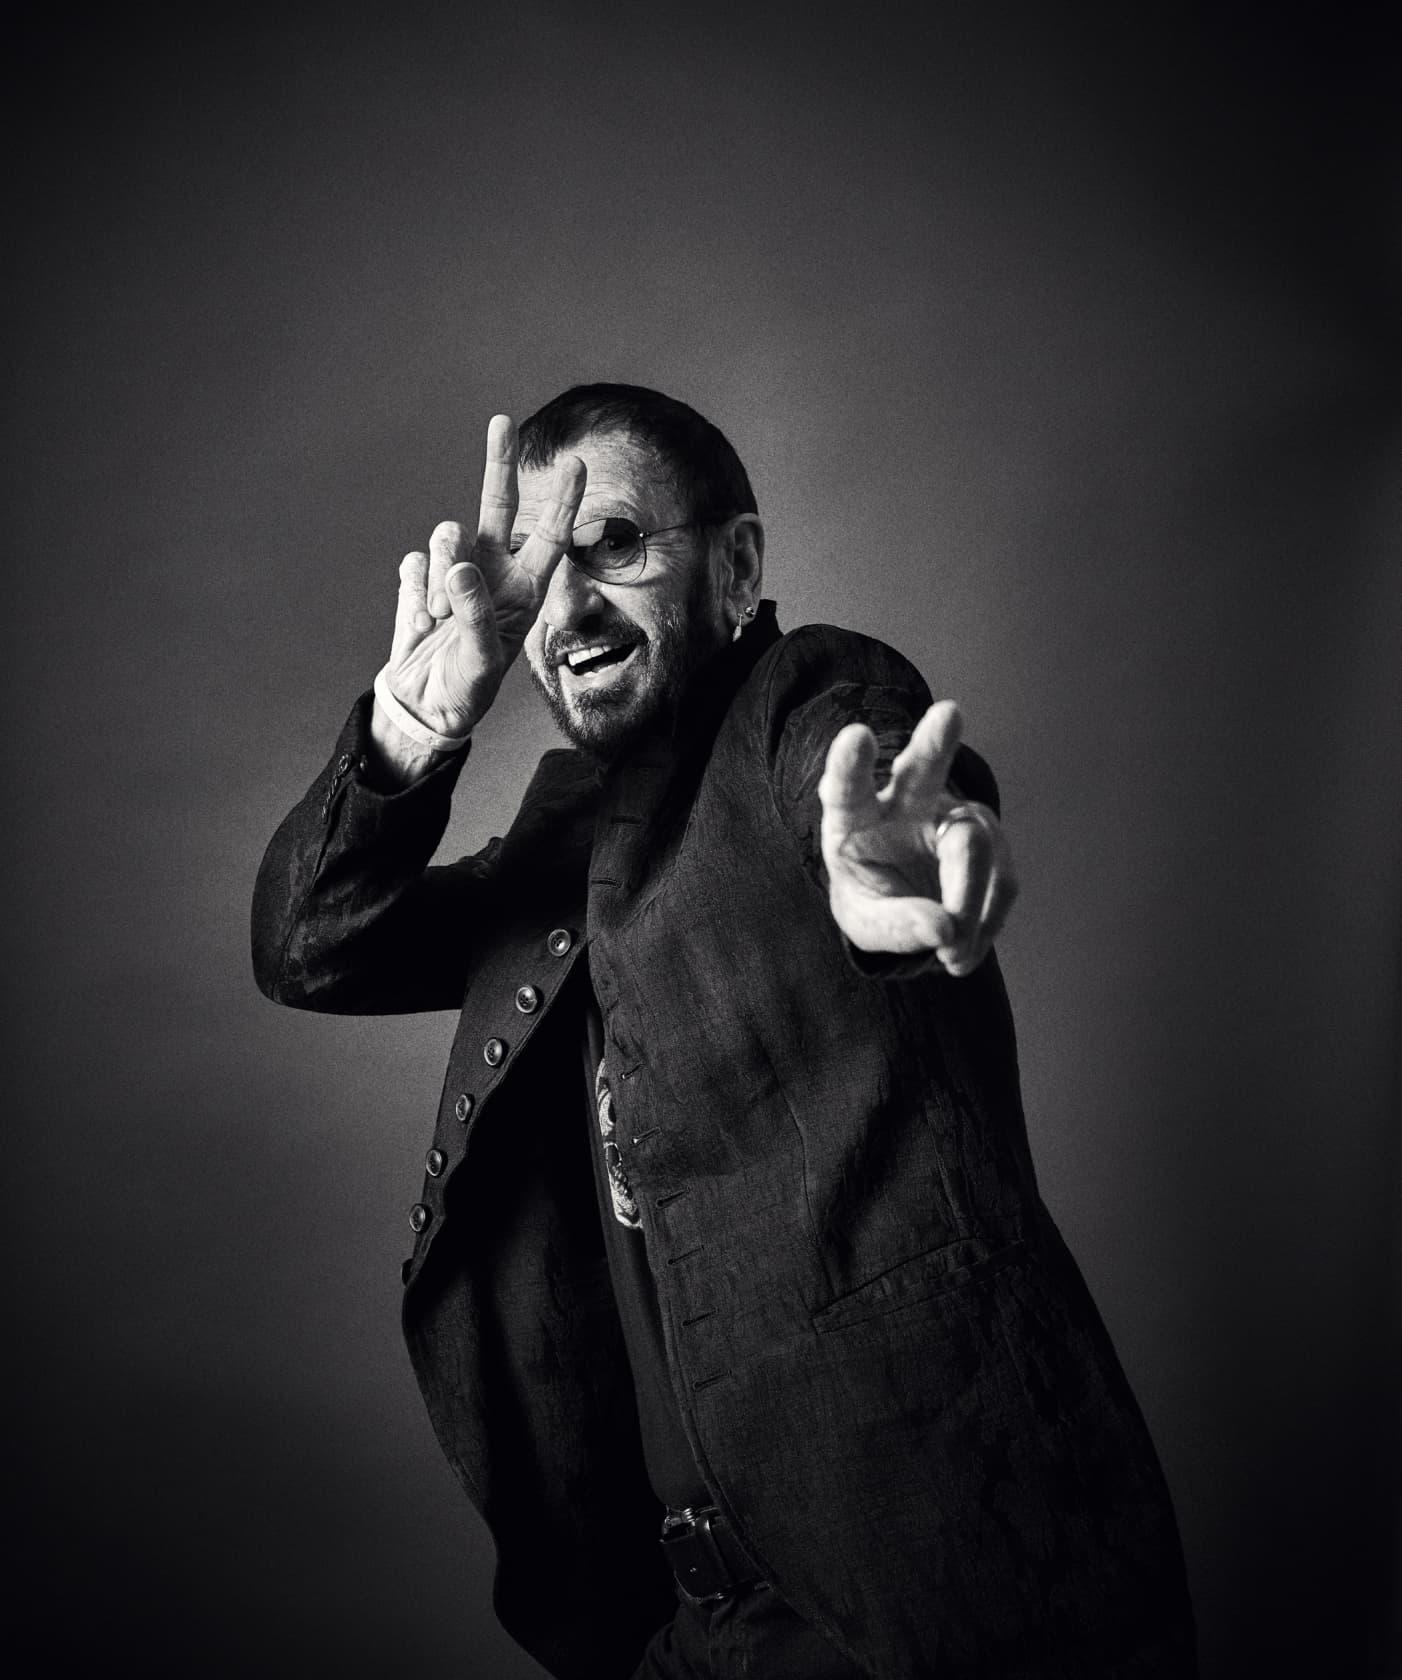 Andy Gotts Ringo Starr Fine Art Giclée Archival Print